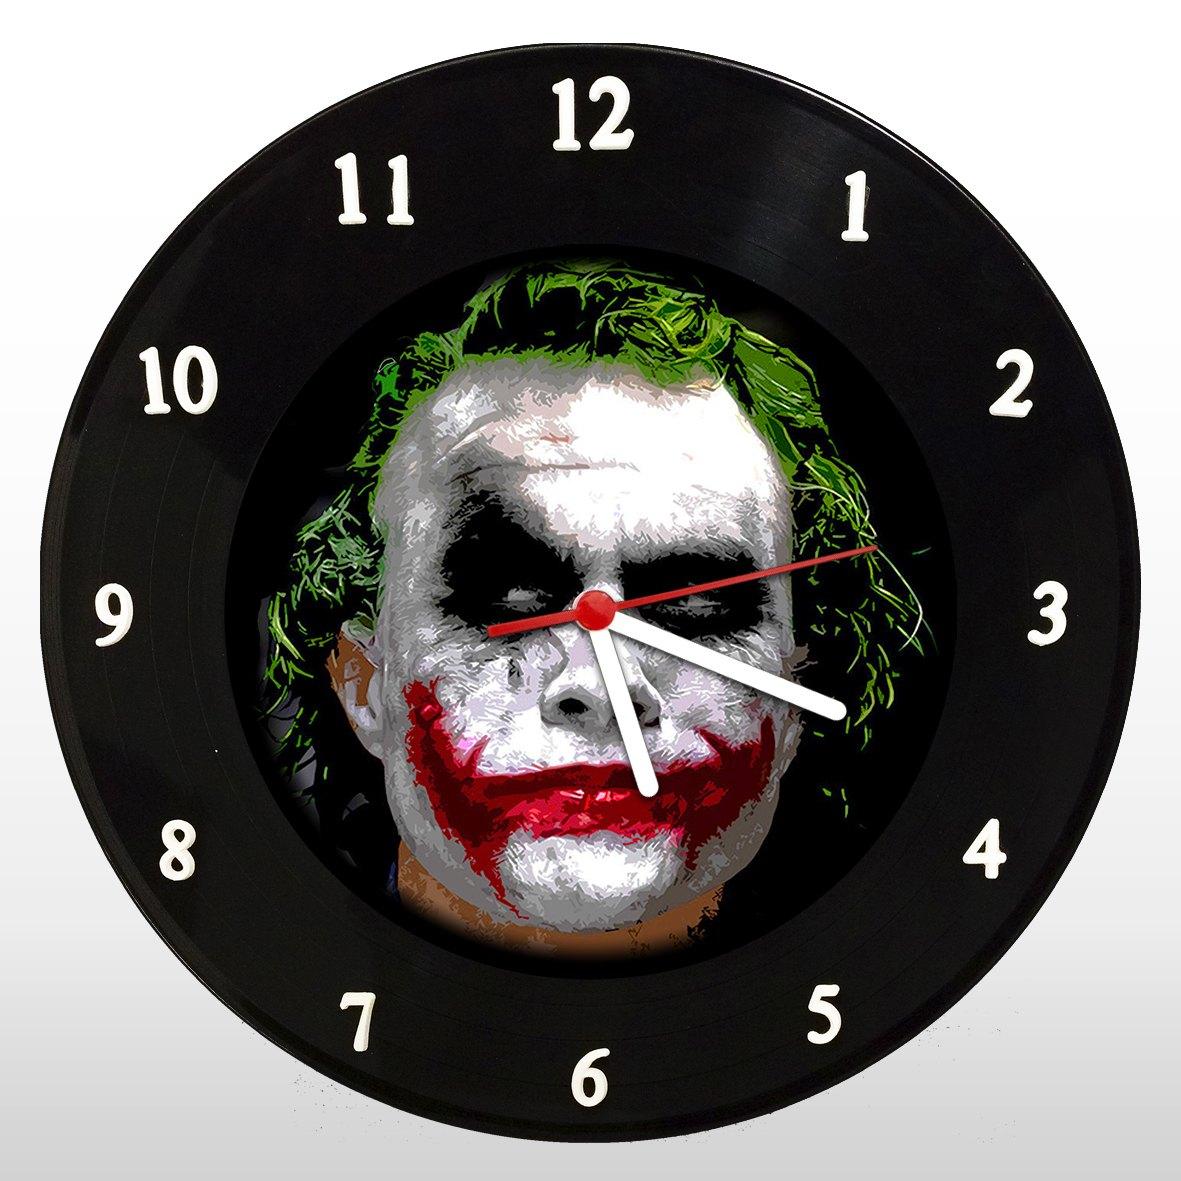 Coringa - Heath Ledger - Relógio de Parede em Disco de Vinil - Mr. Rock